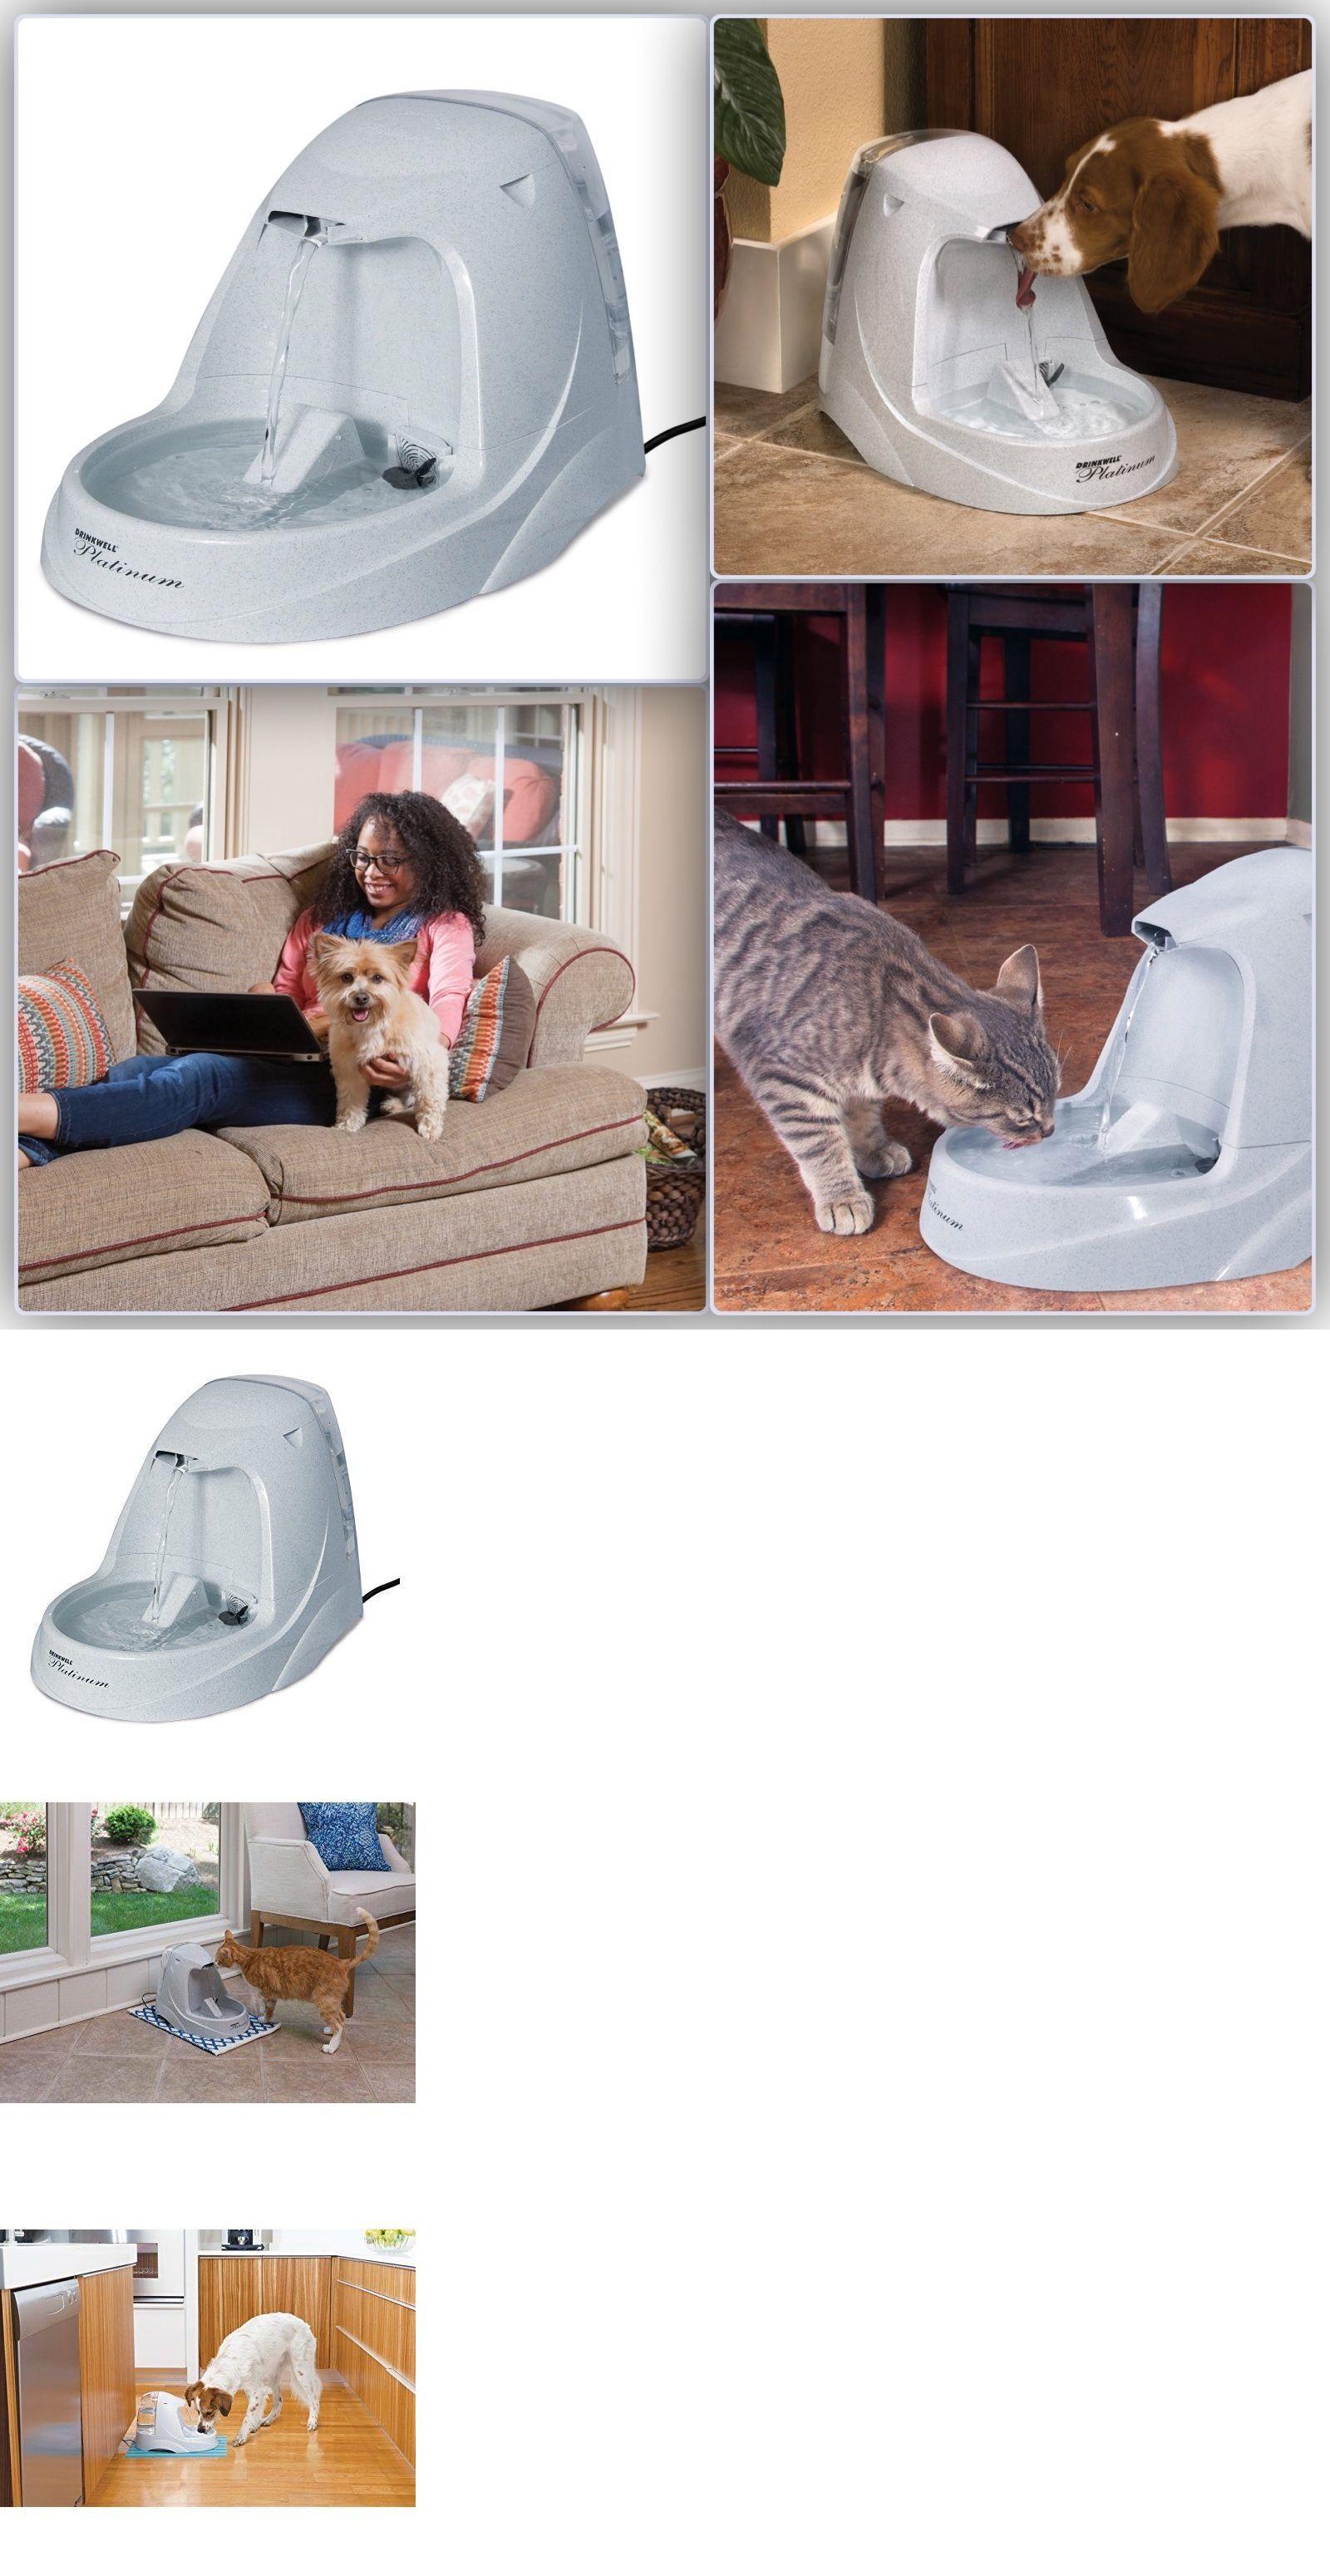 stool v vesper automatic cats walnut scratcher catit next feeder for feeders petbarn cat katze